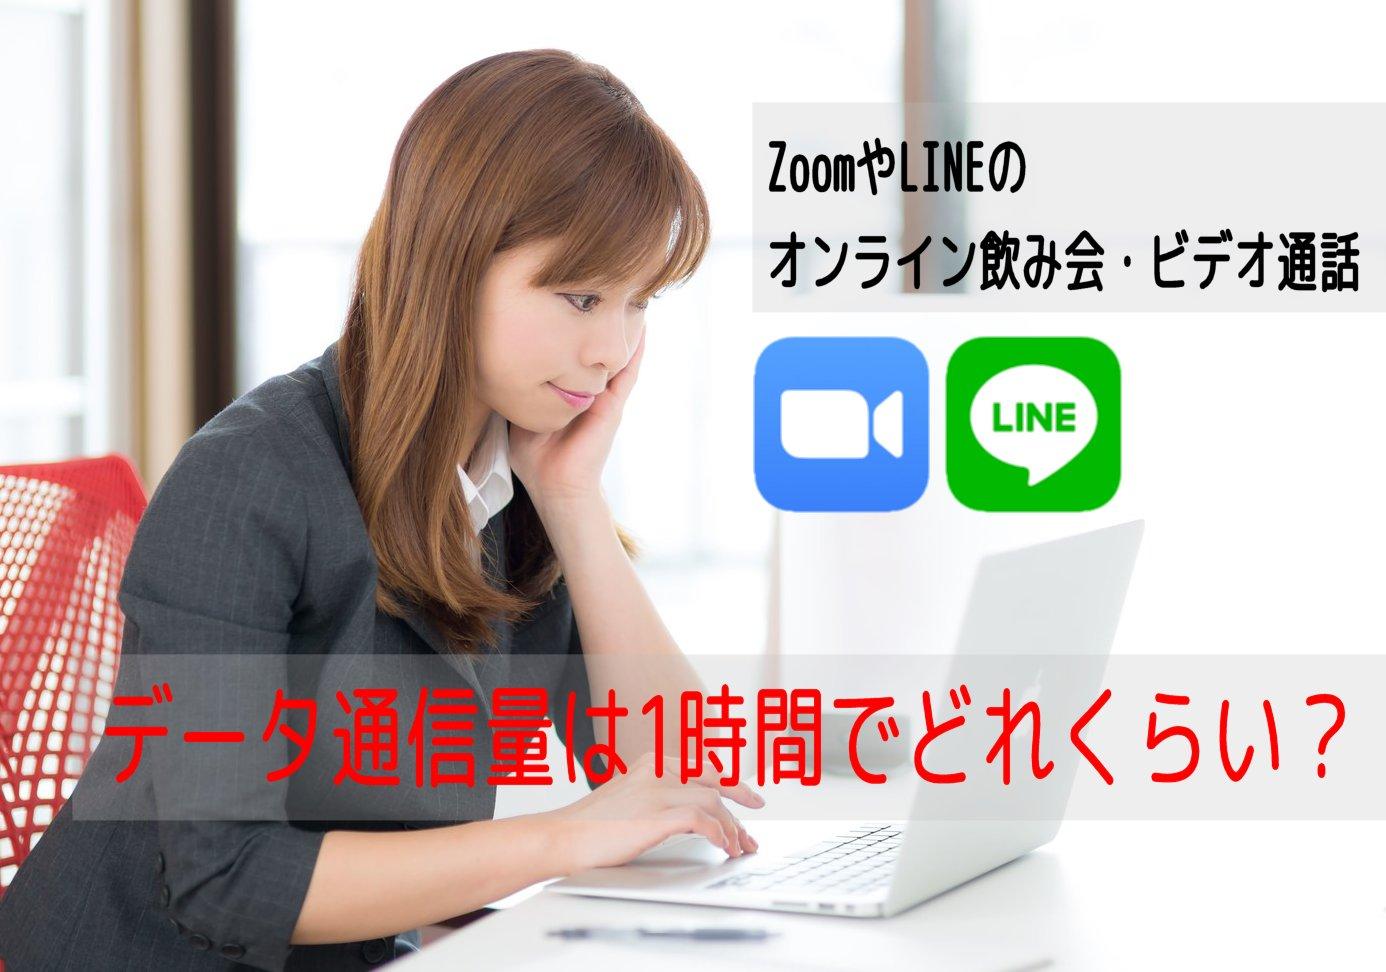 ZoomやLINEのオンライン飲み会・ビデオ通話のデータ通信量は1時間でどれくらい?